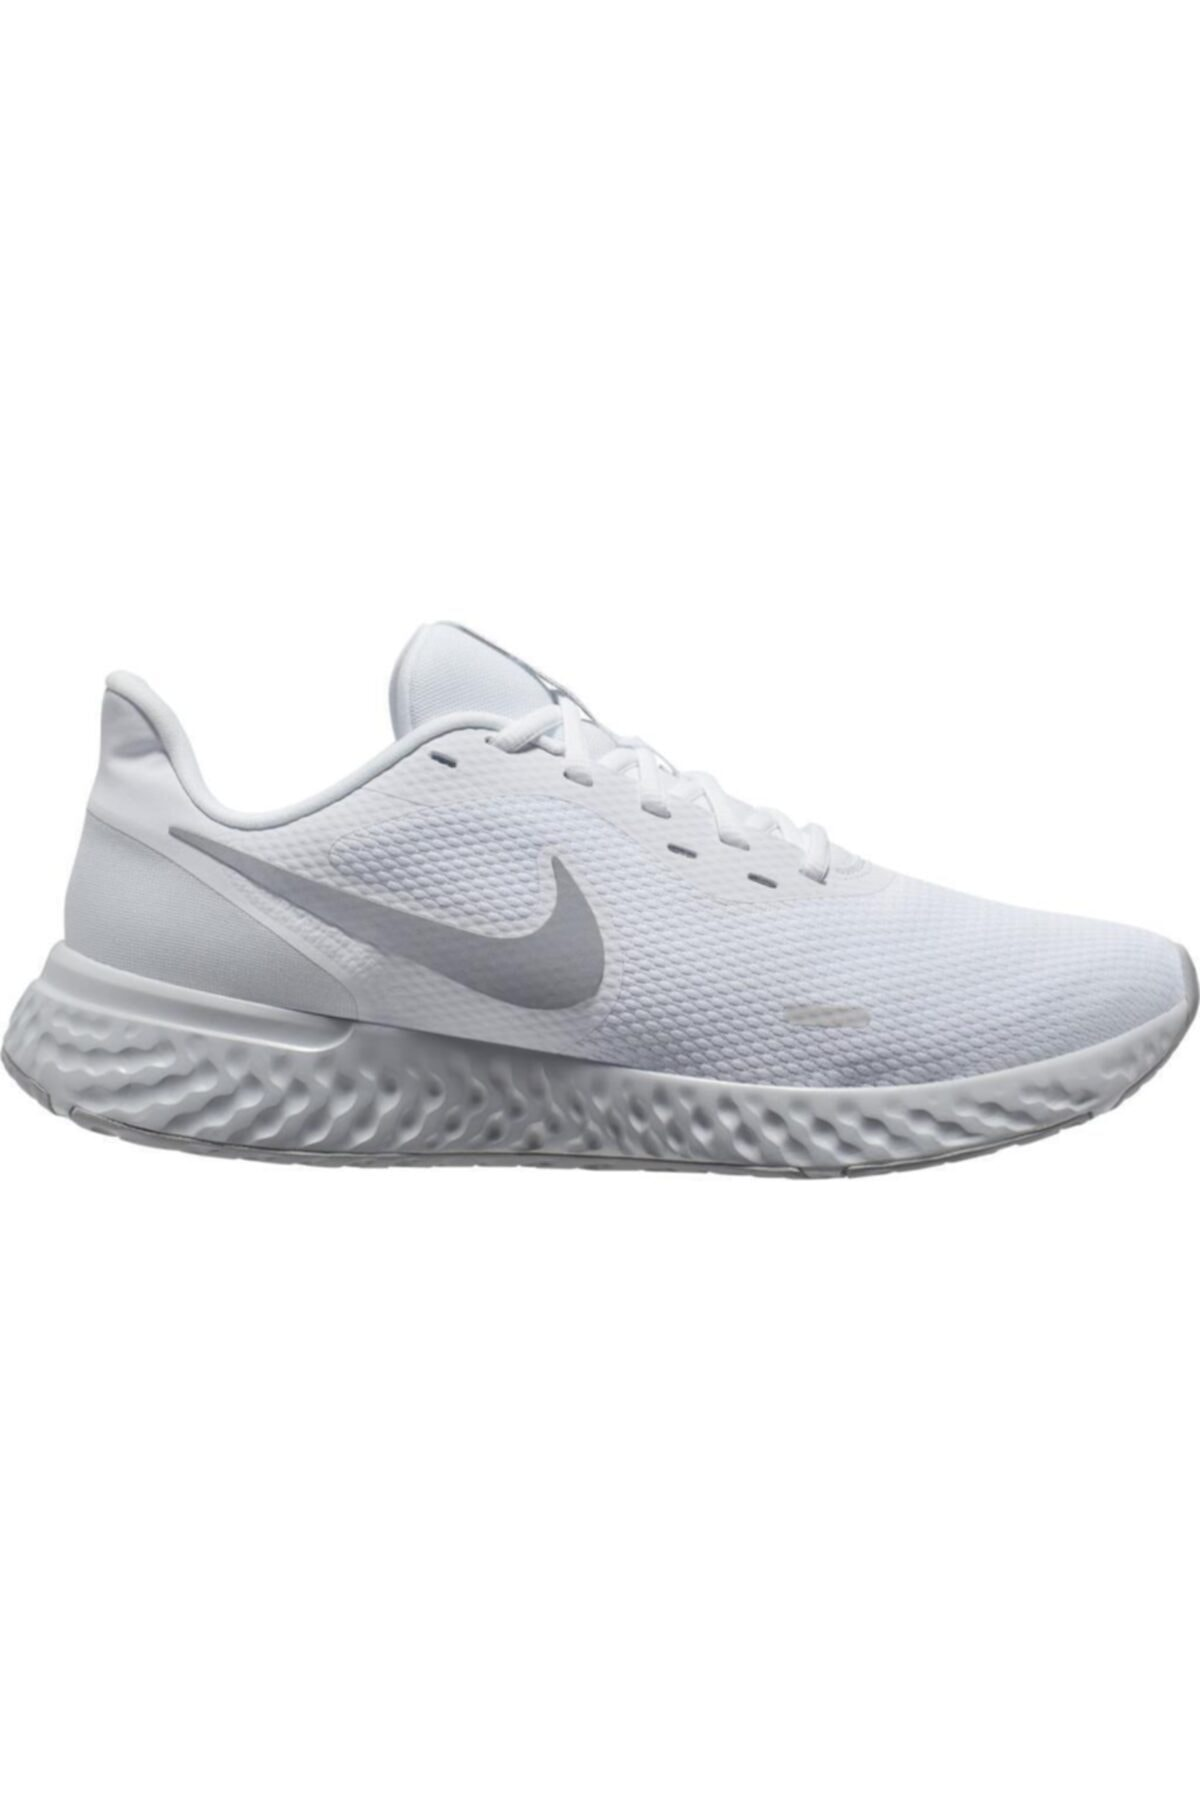 Nike Bq3207-100 Wmns Revolution 5 Kadın Spor Ayakkabı 1